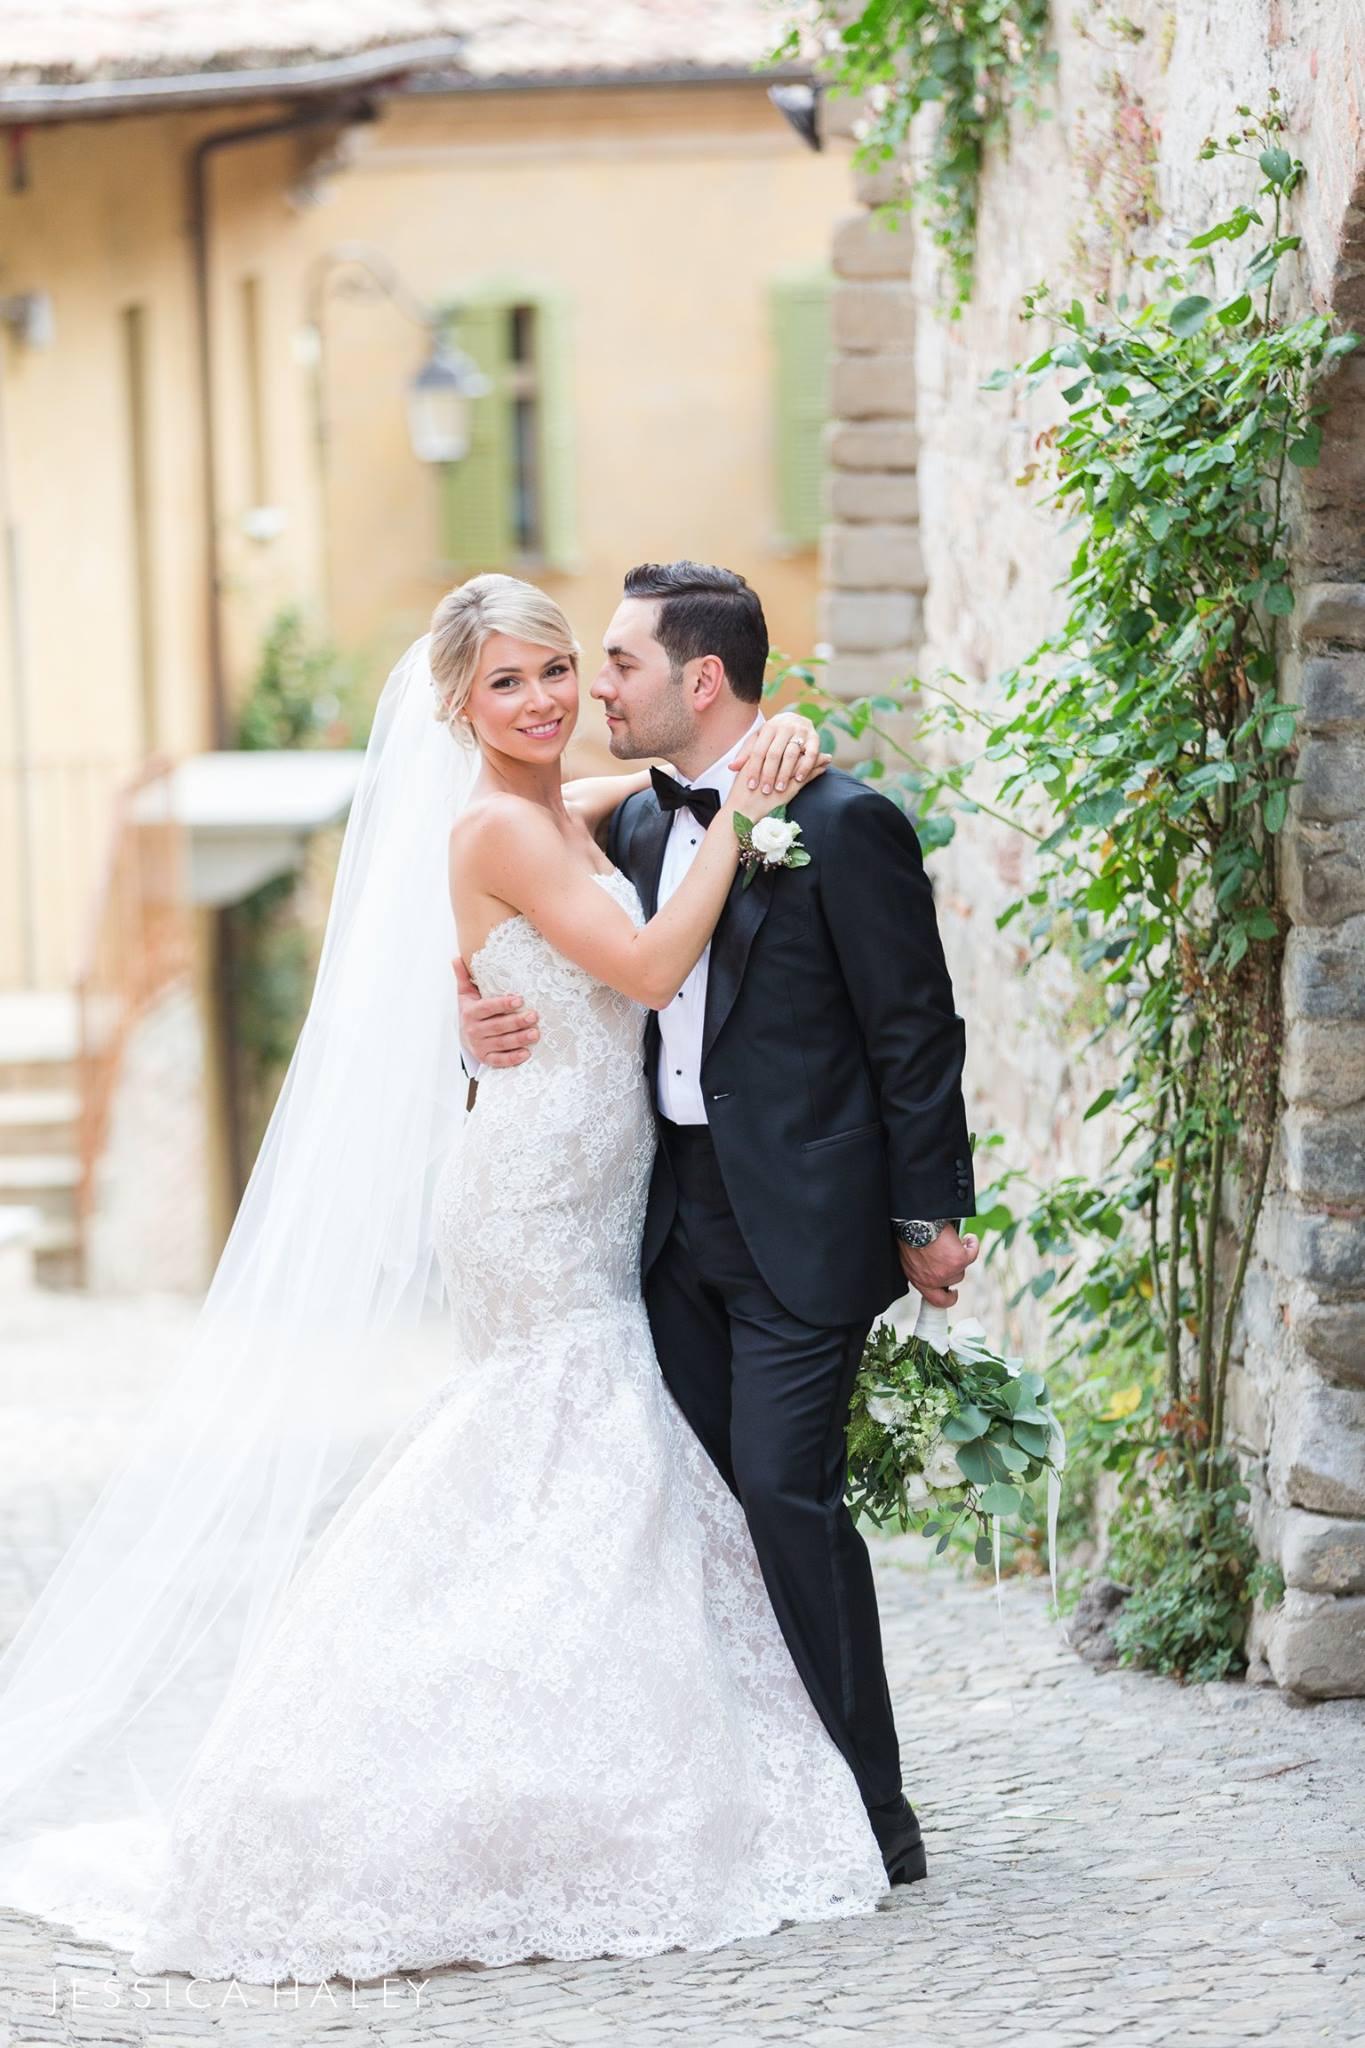 alex-edge-destination-wedding-italy-2.jpg